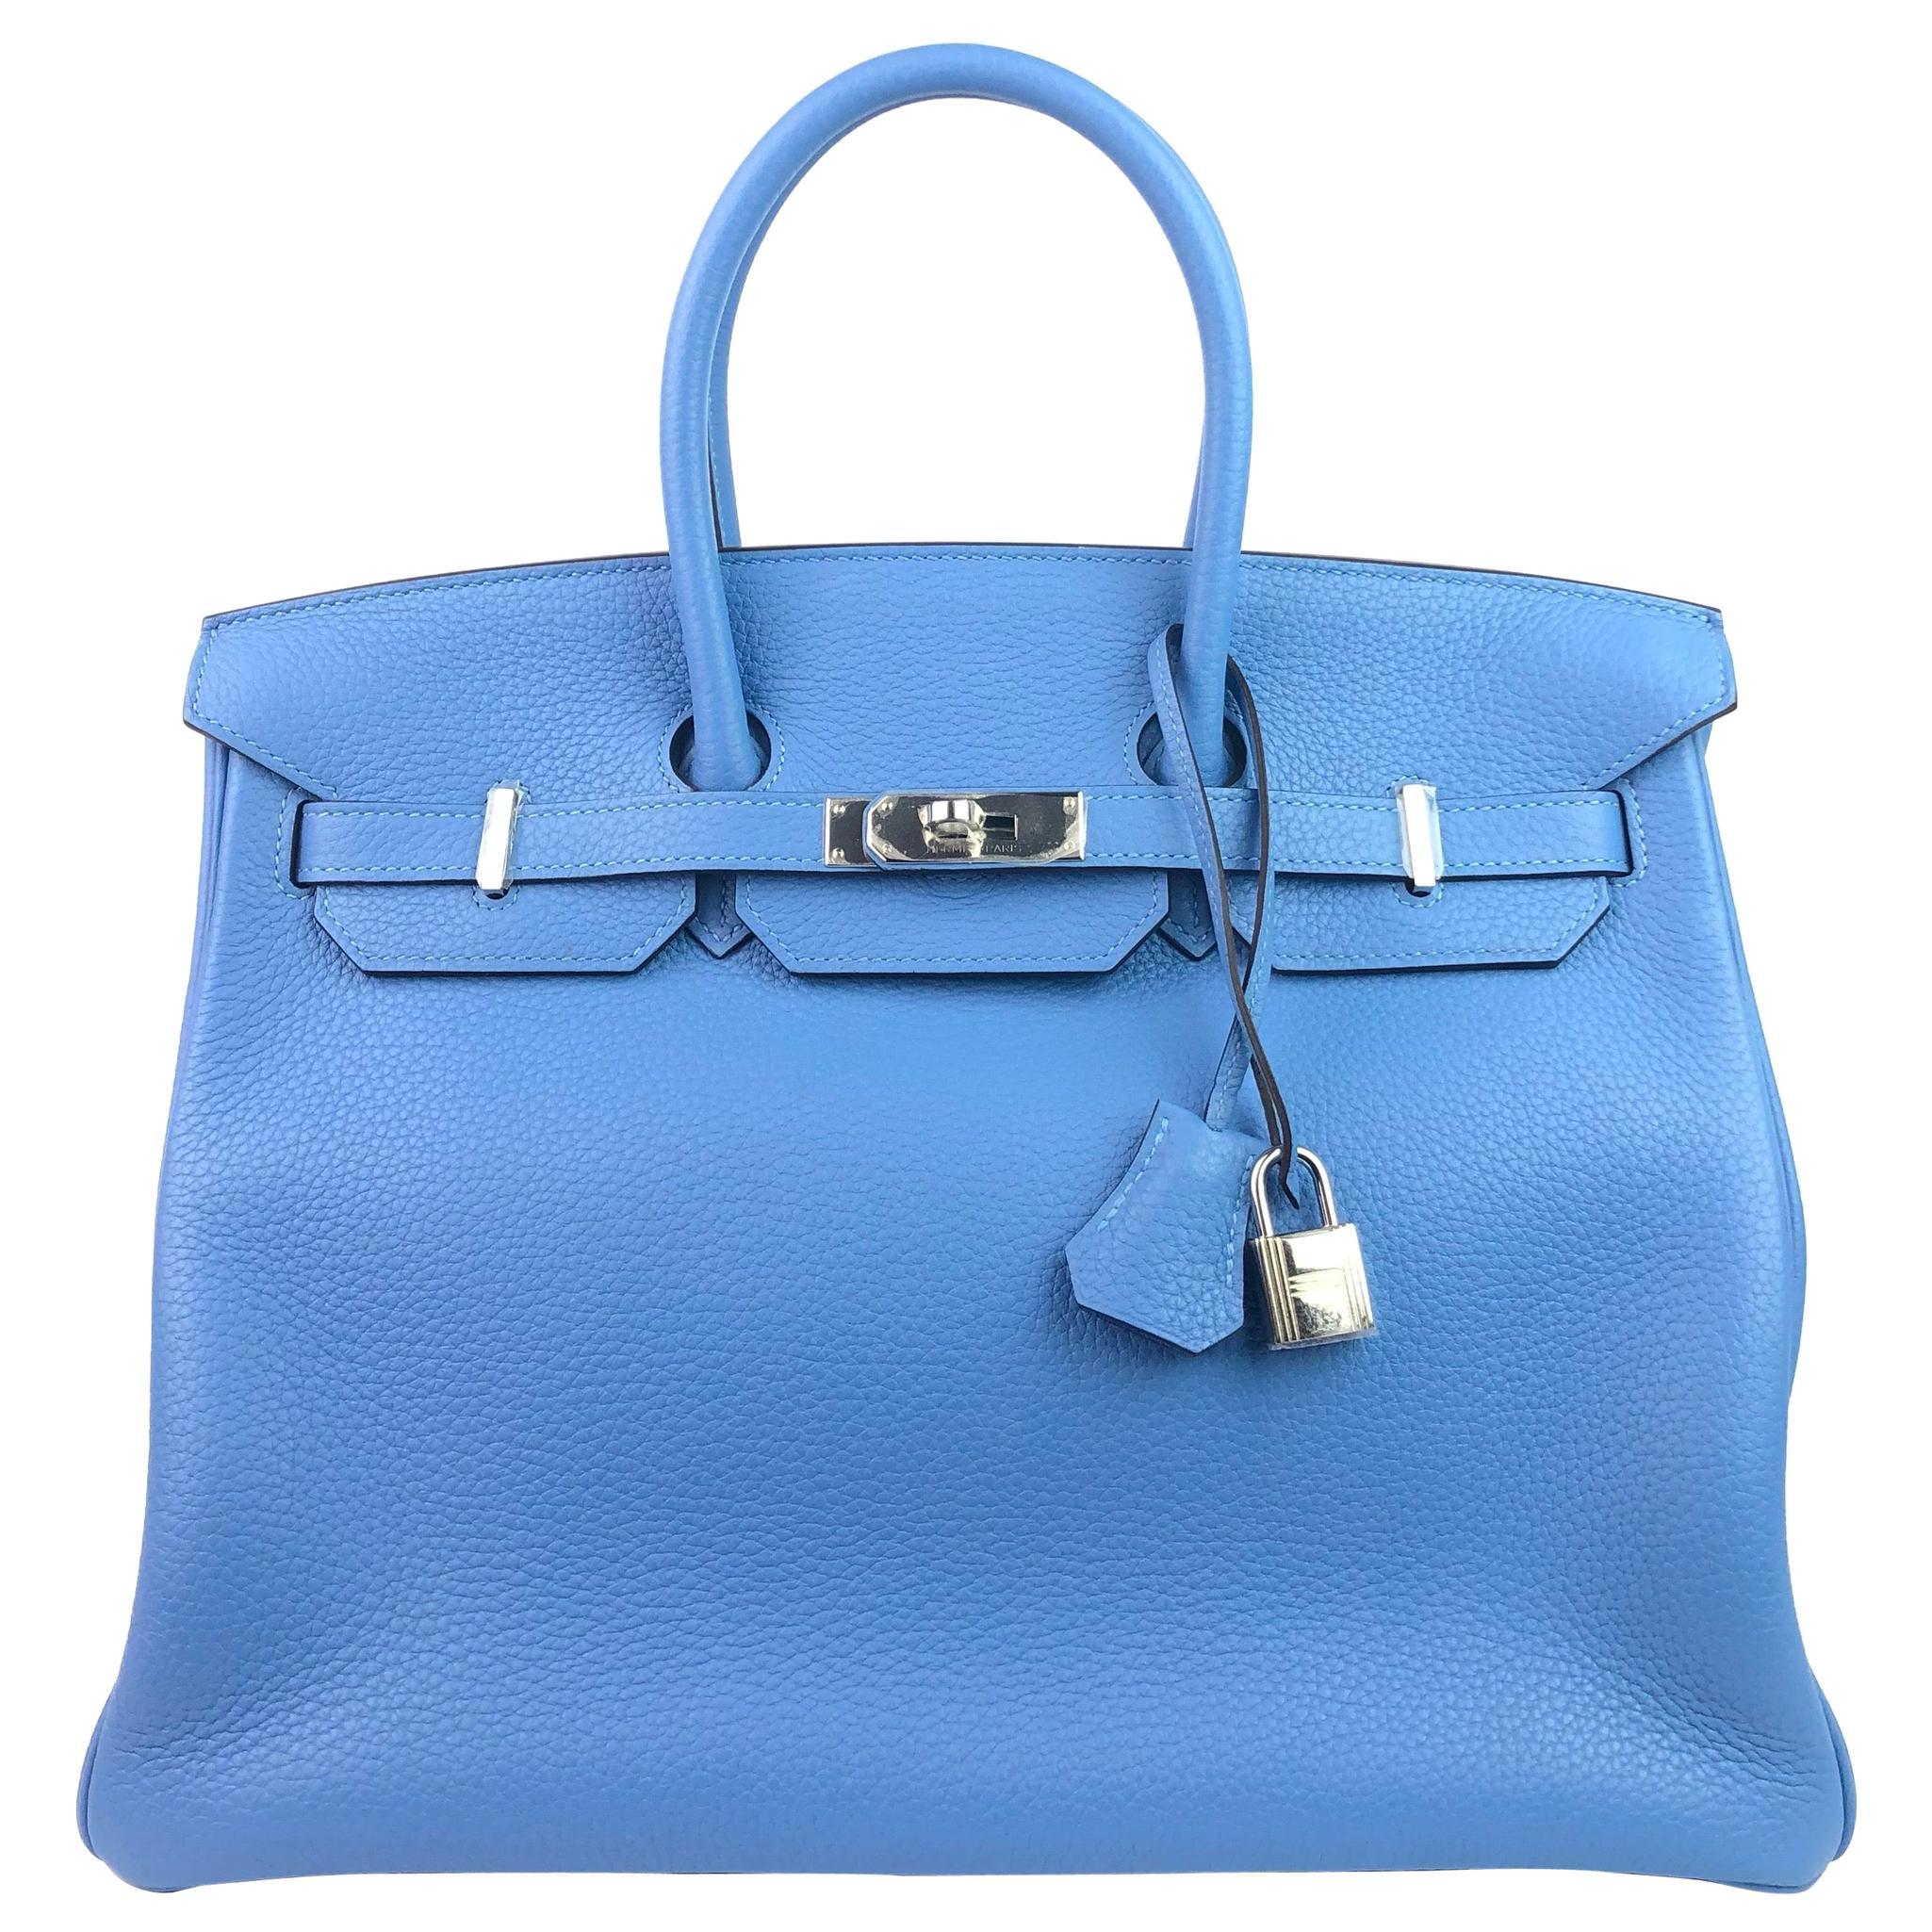 Hermes Birkin 35 Blue Paradise Palladium Hardware